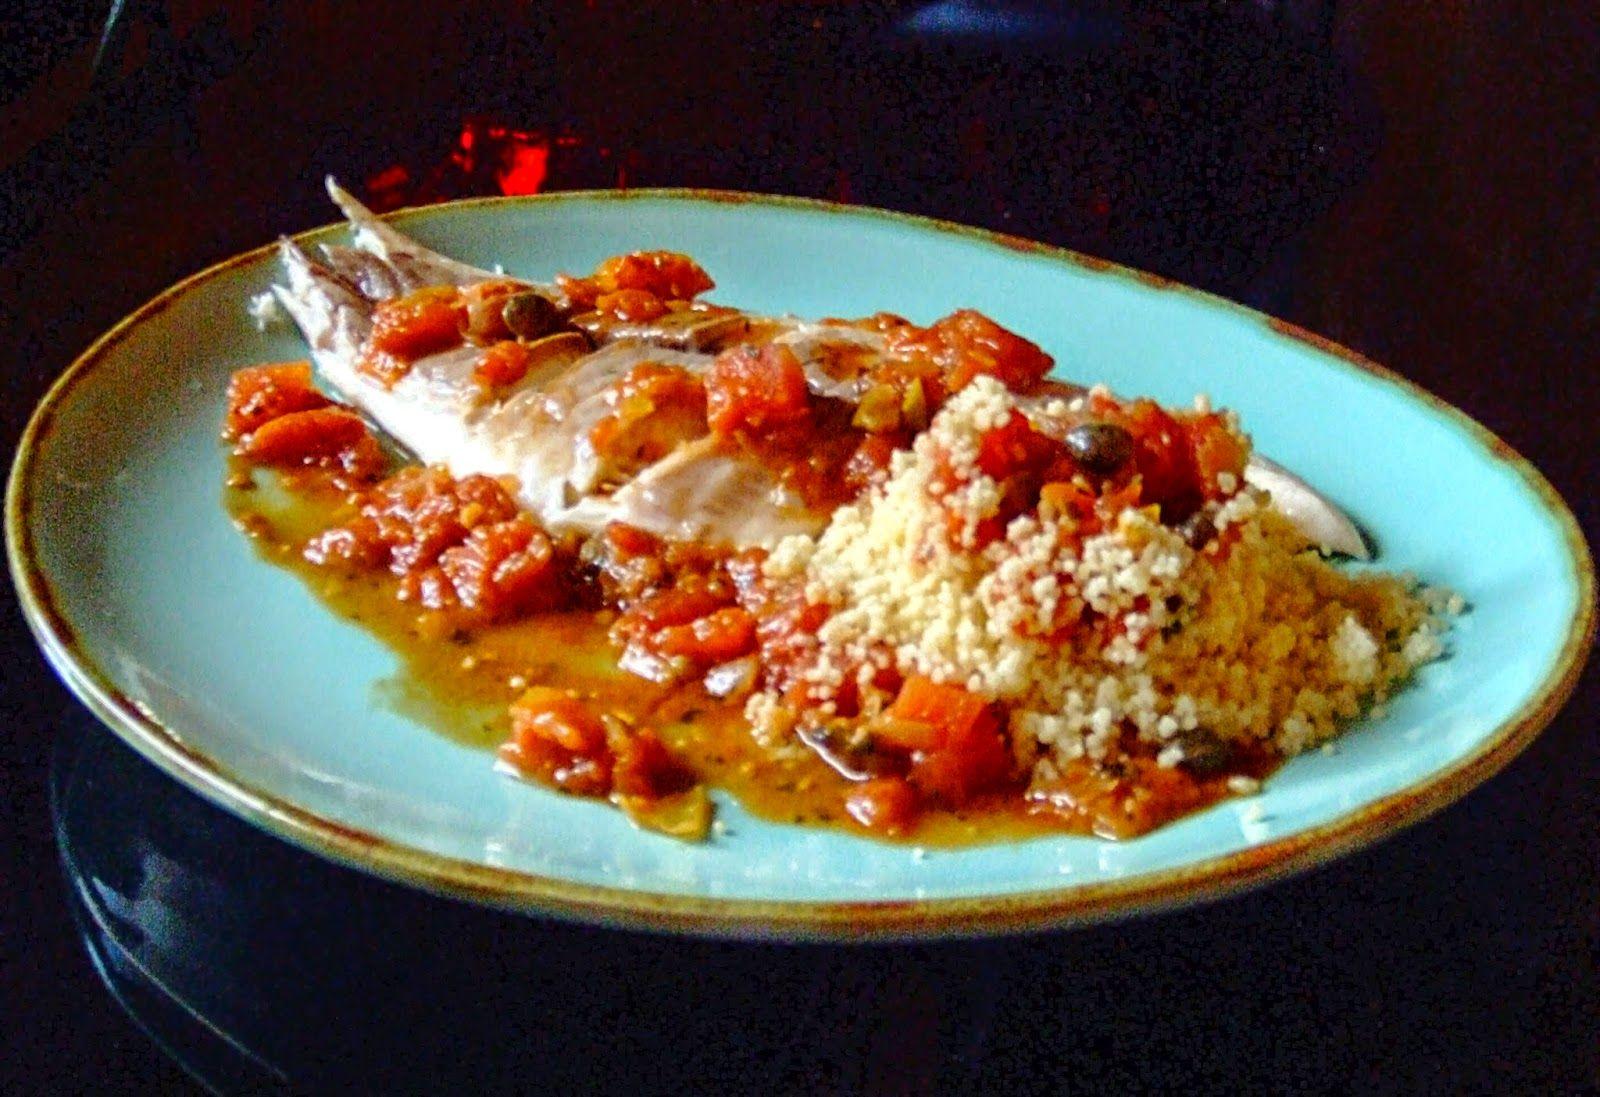 1049df5bc1068fb4bab4bf3e14865282 - Salsiccetta Ricette